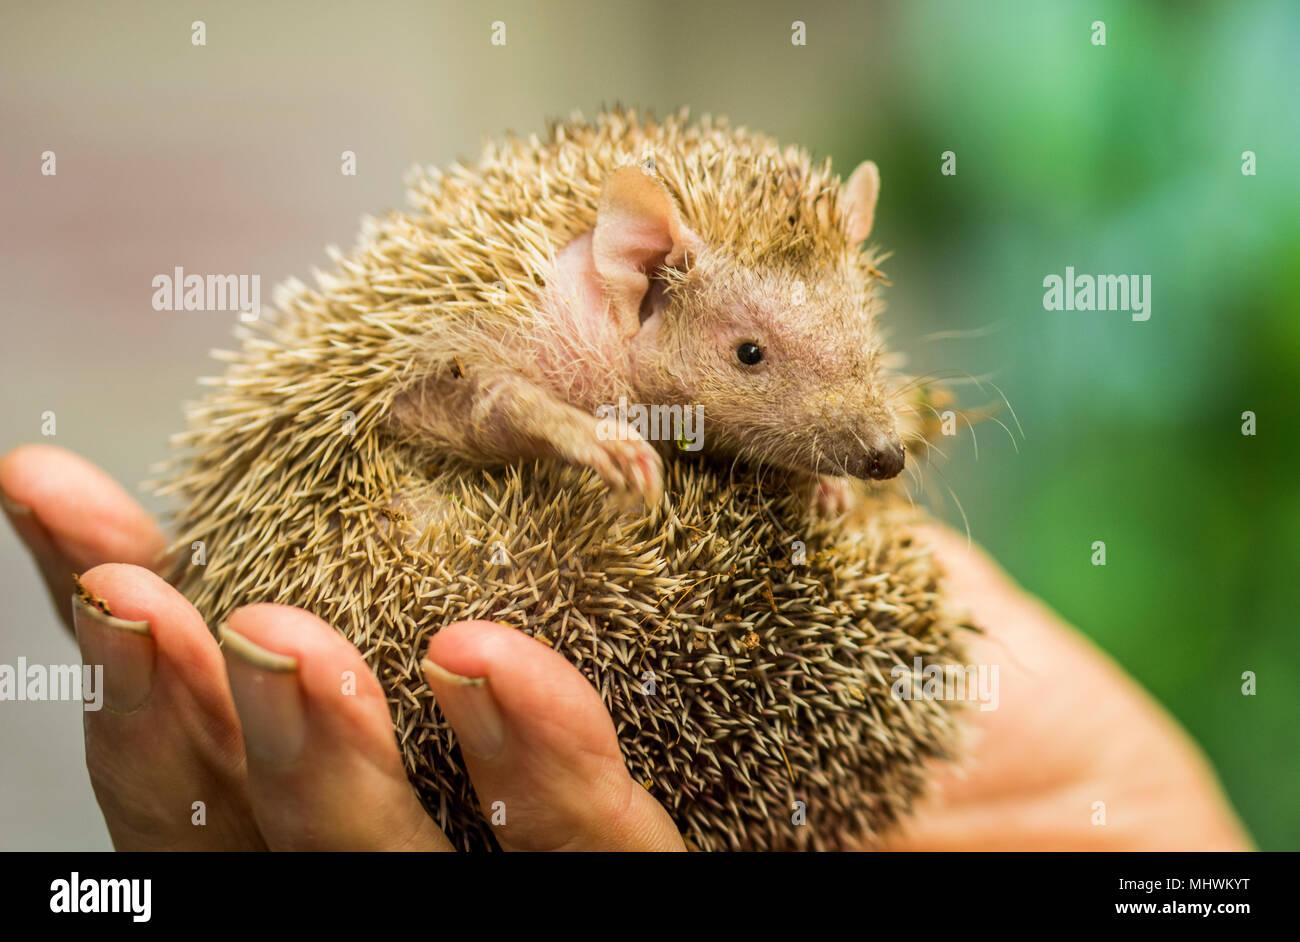 Cute litle Tenrec hält in der Hand gehalten wird, Stockbild